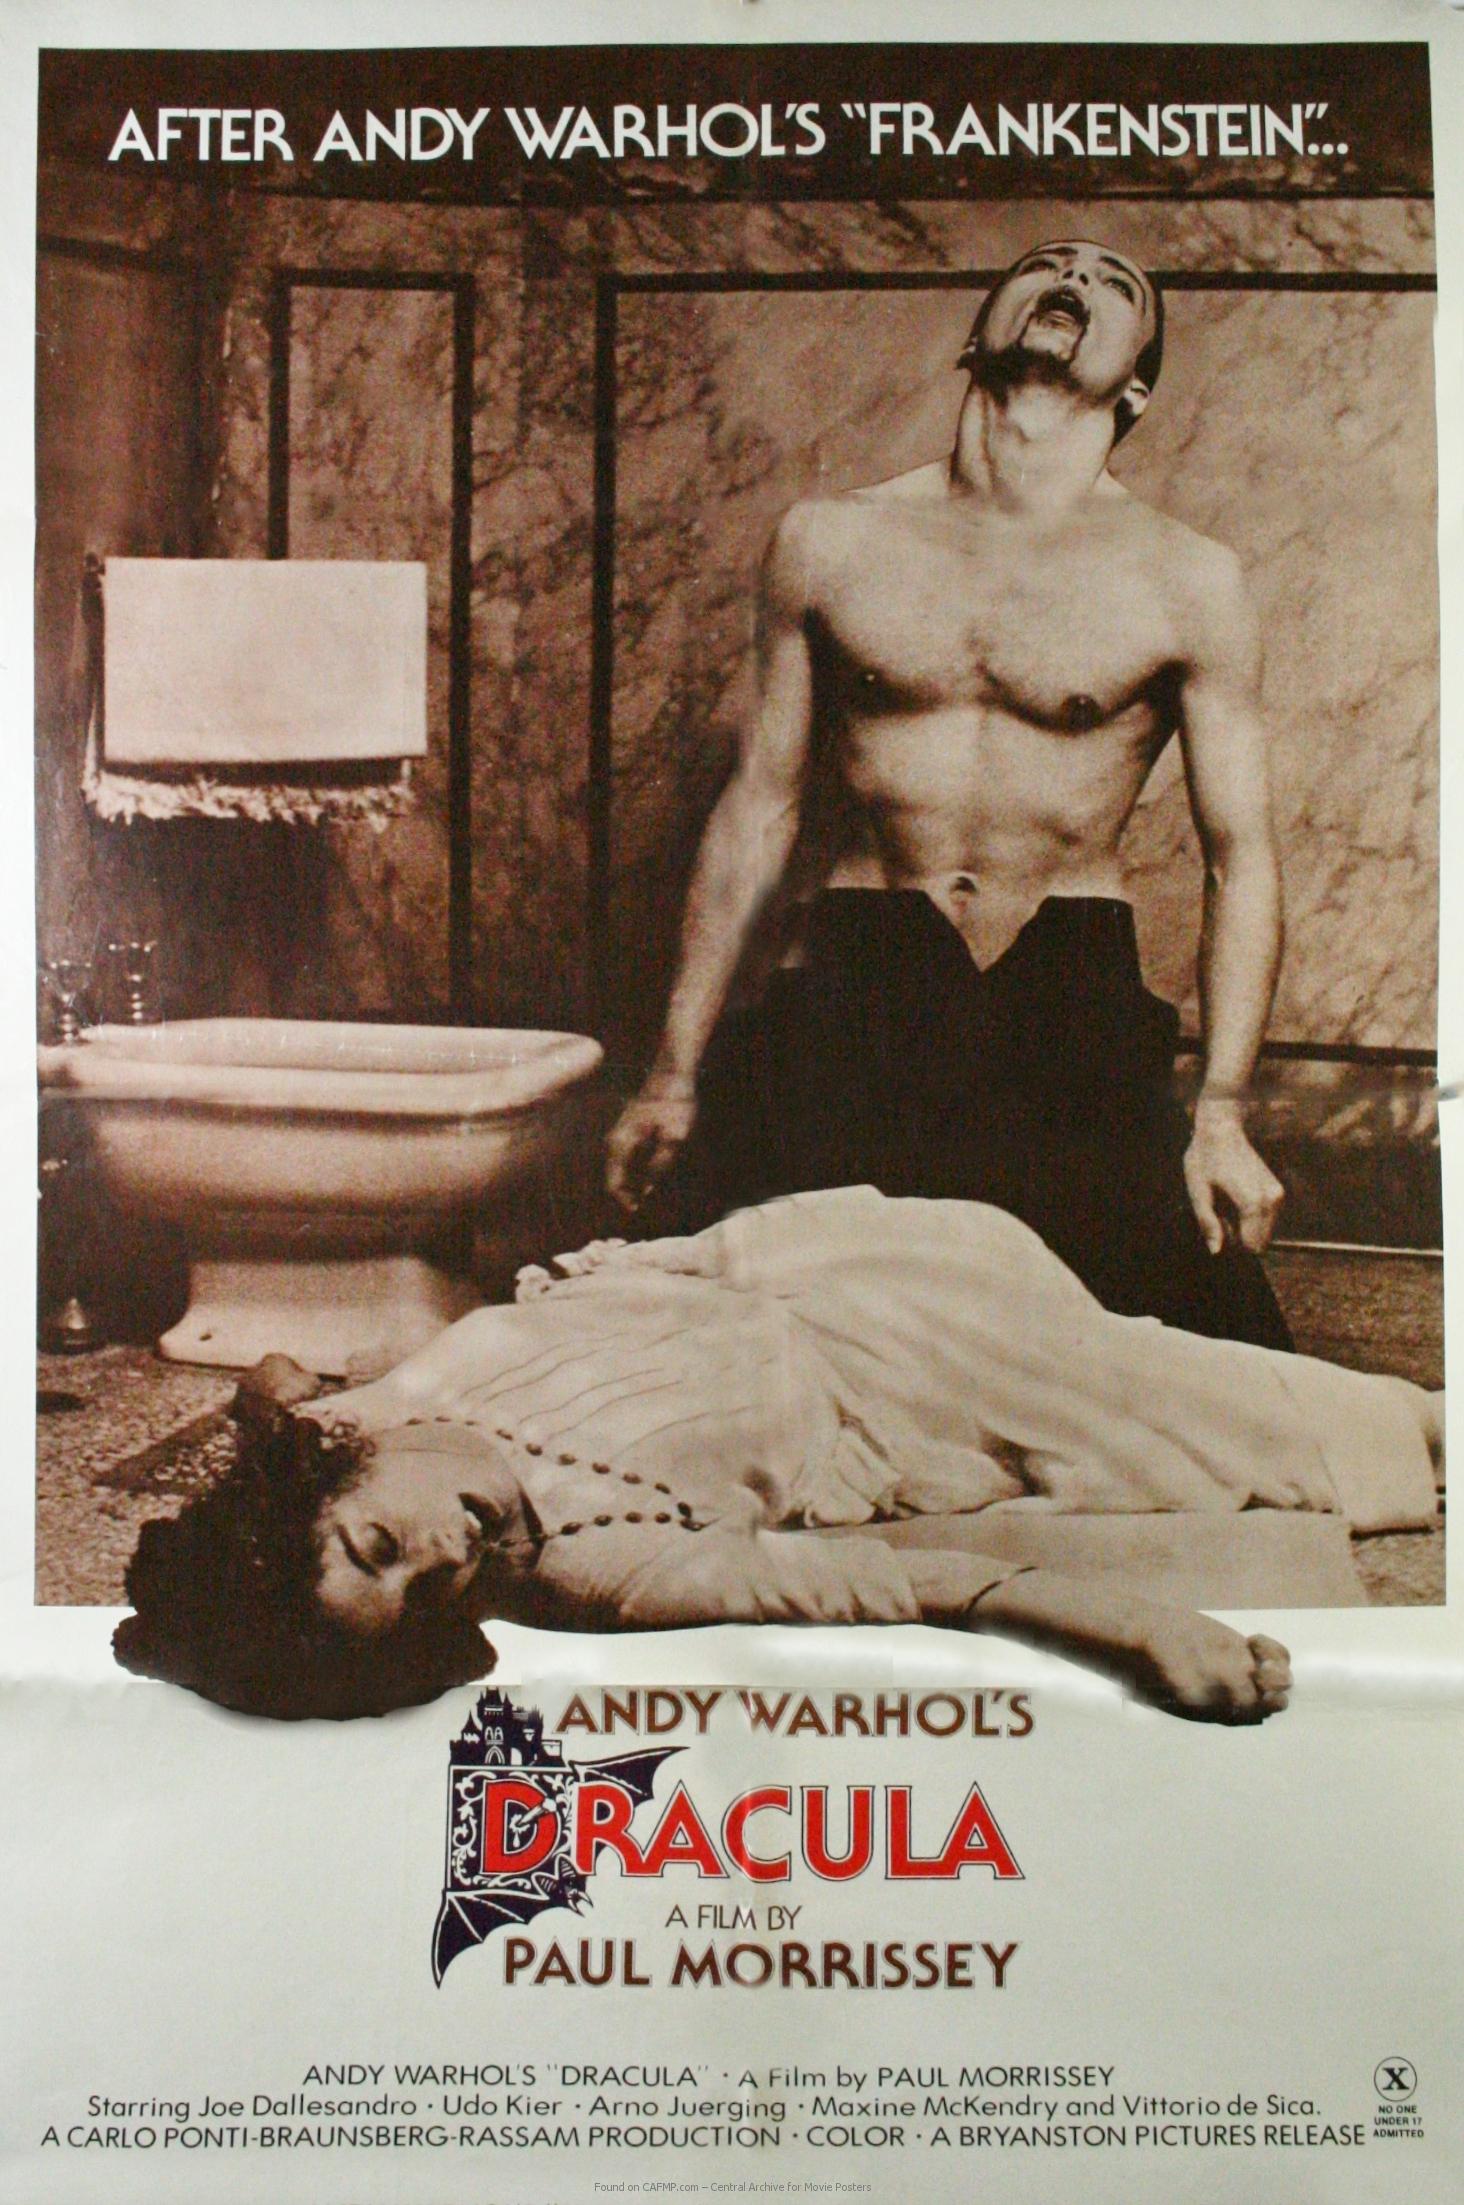 Movie Poster »Warhols Dracula« on CAFMP